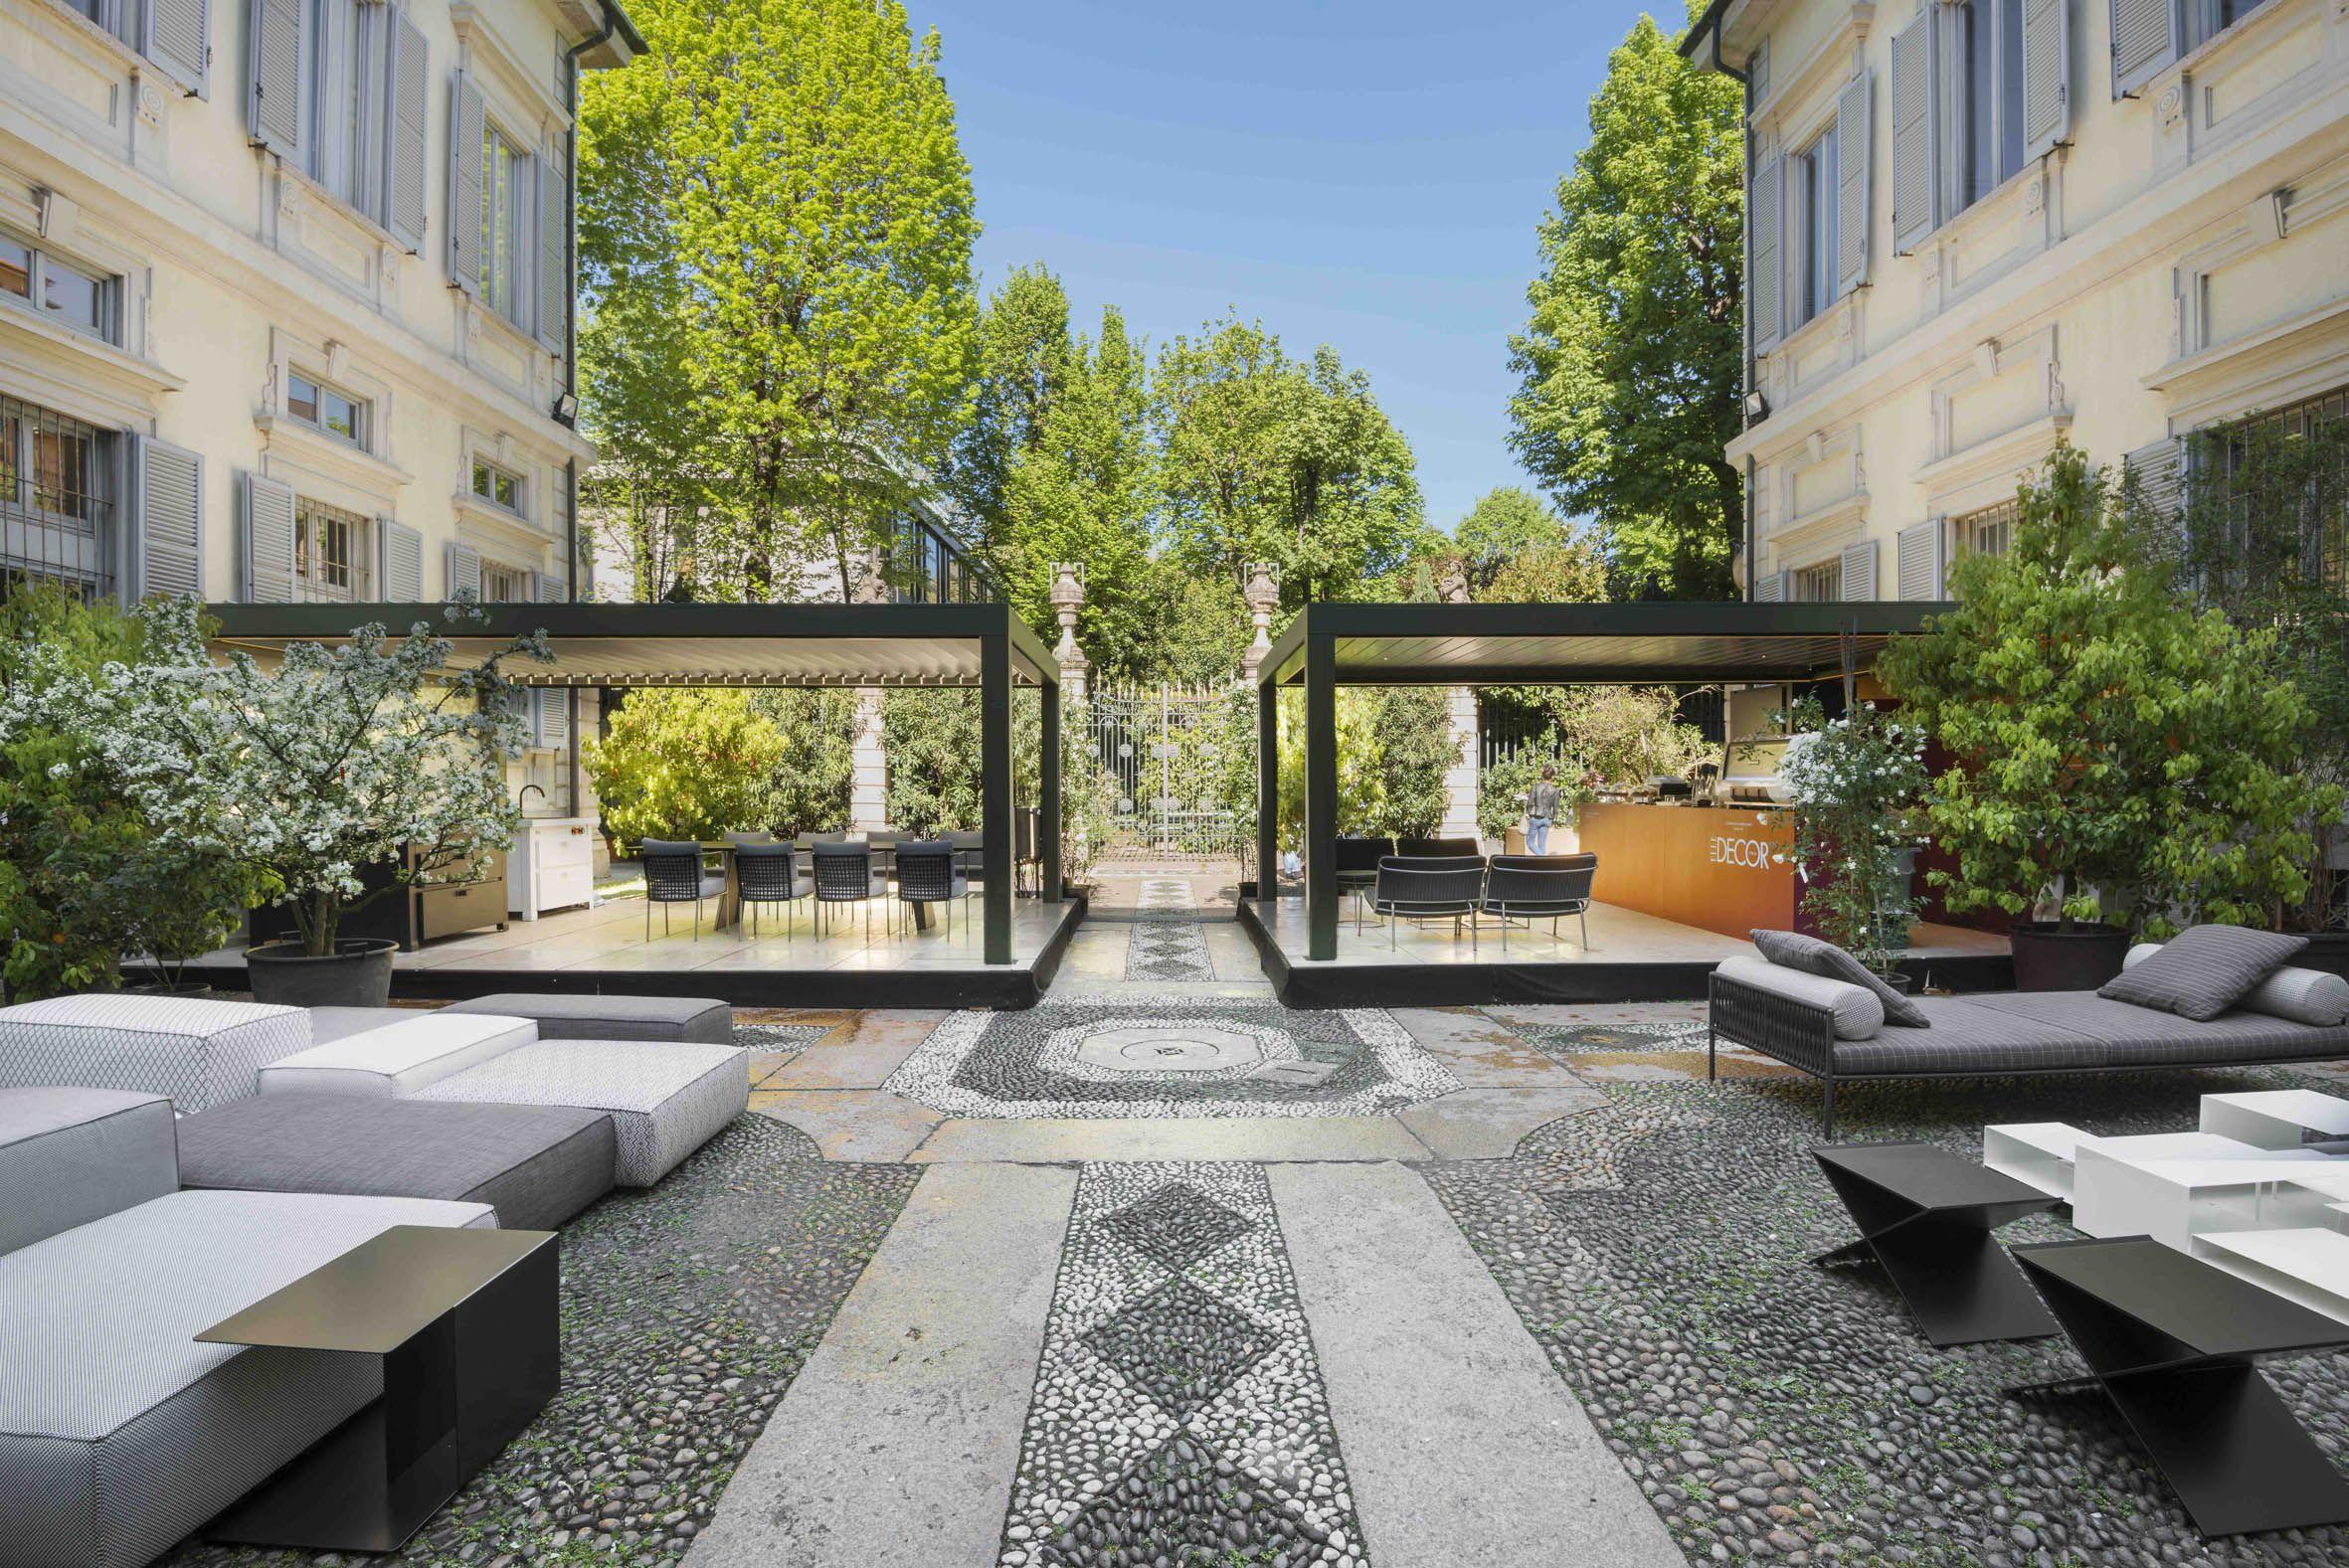 Home garden furniture  Soft Home outdoor Palazzo Bovara  MODERN GARDEN  Pinterest